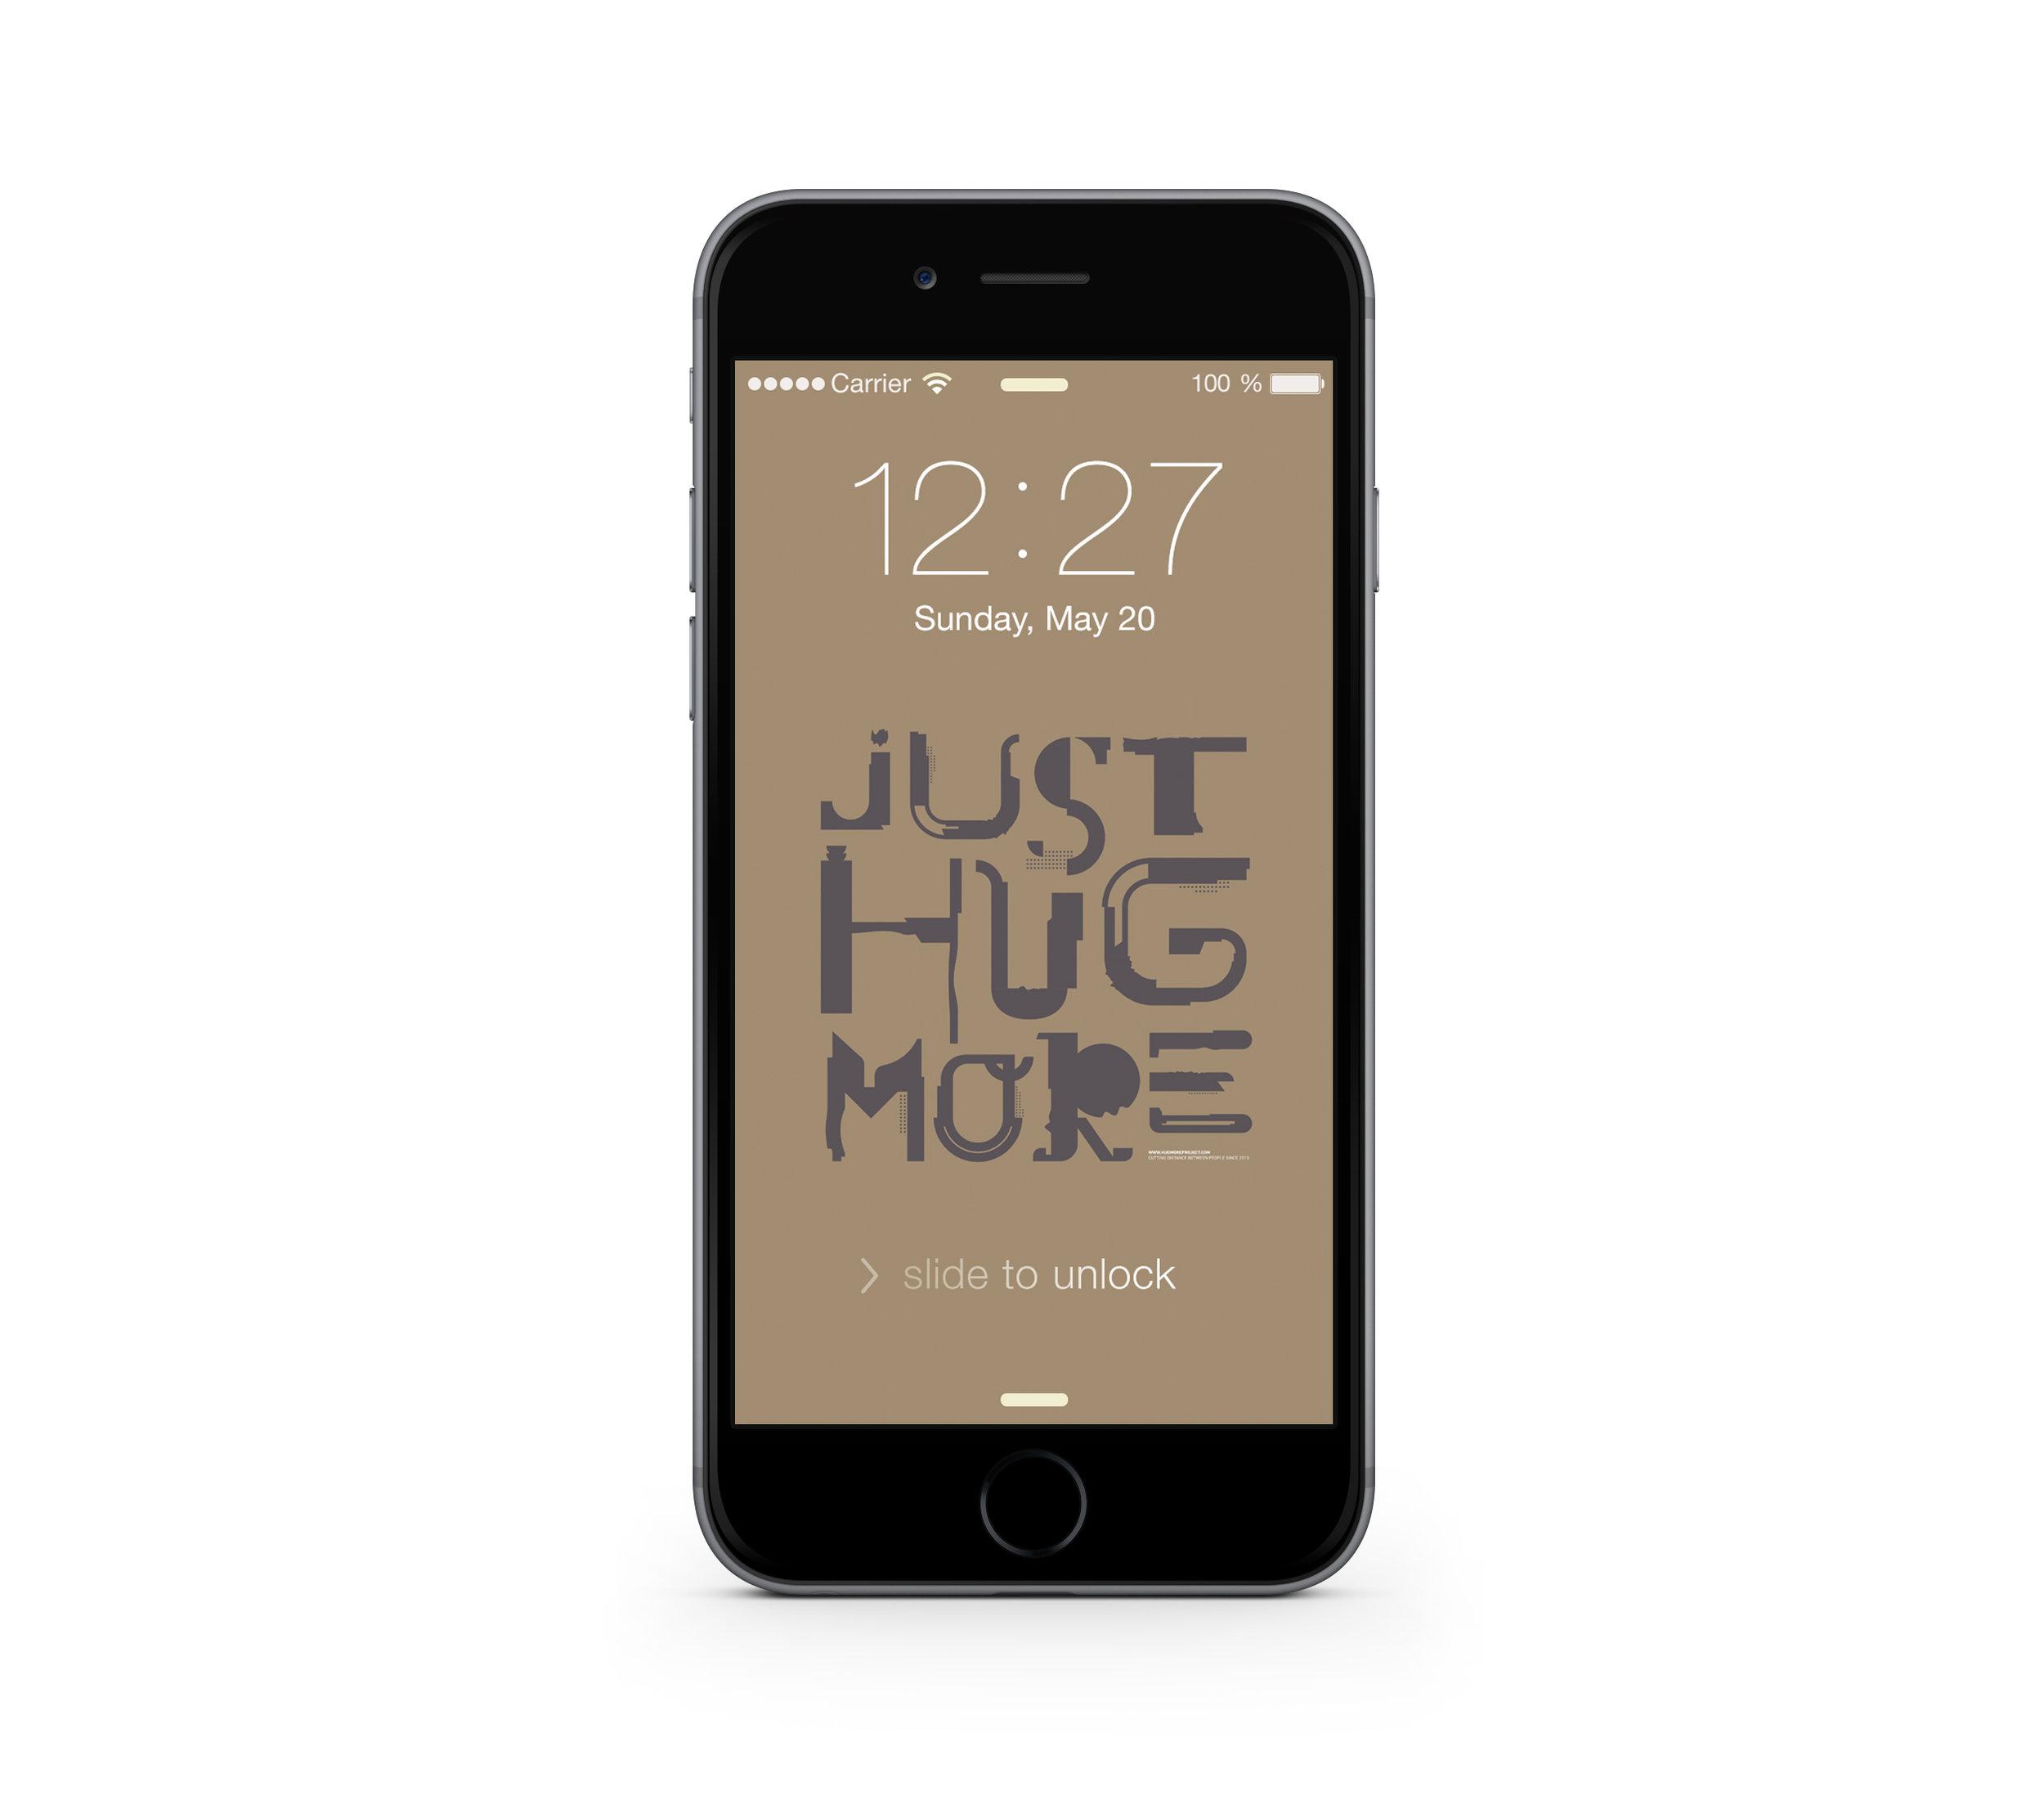 just-hug-more-typo-025-iPhone-mockup-onwhite.jpg